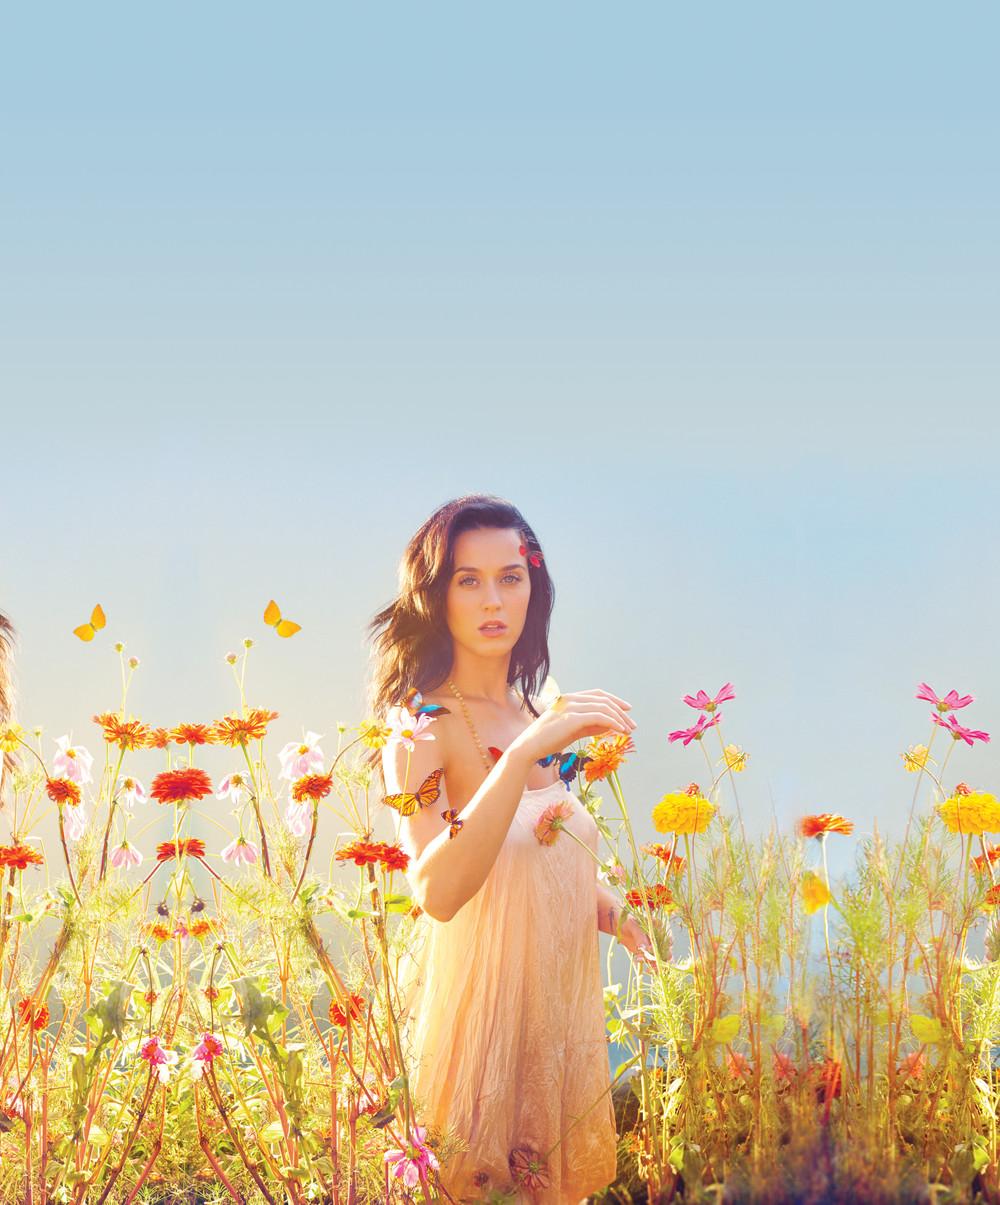 Katy Perry & Kanye West